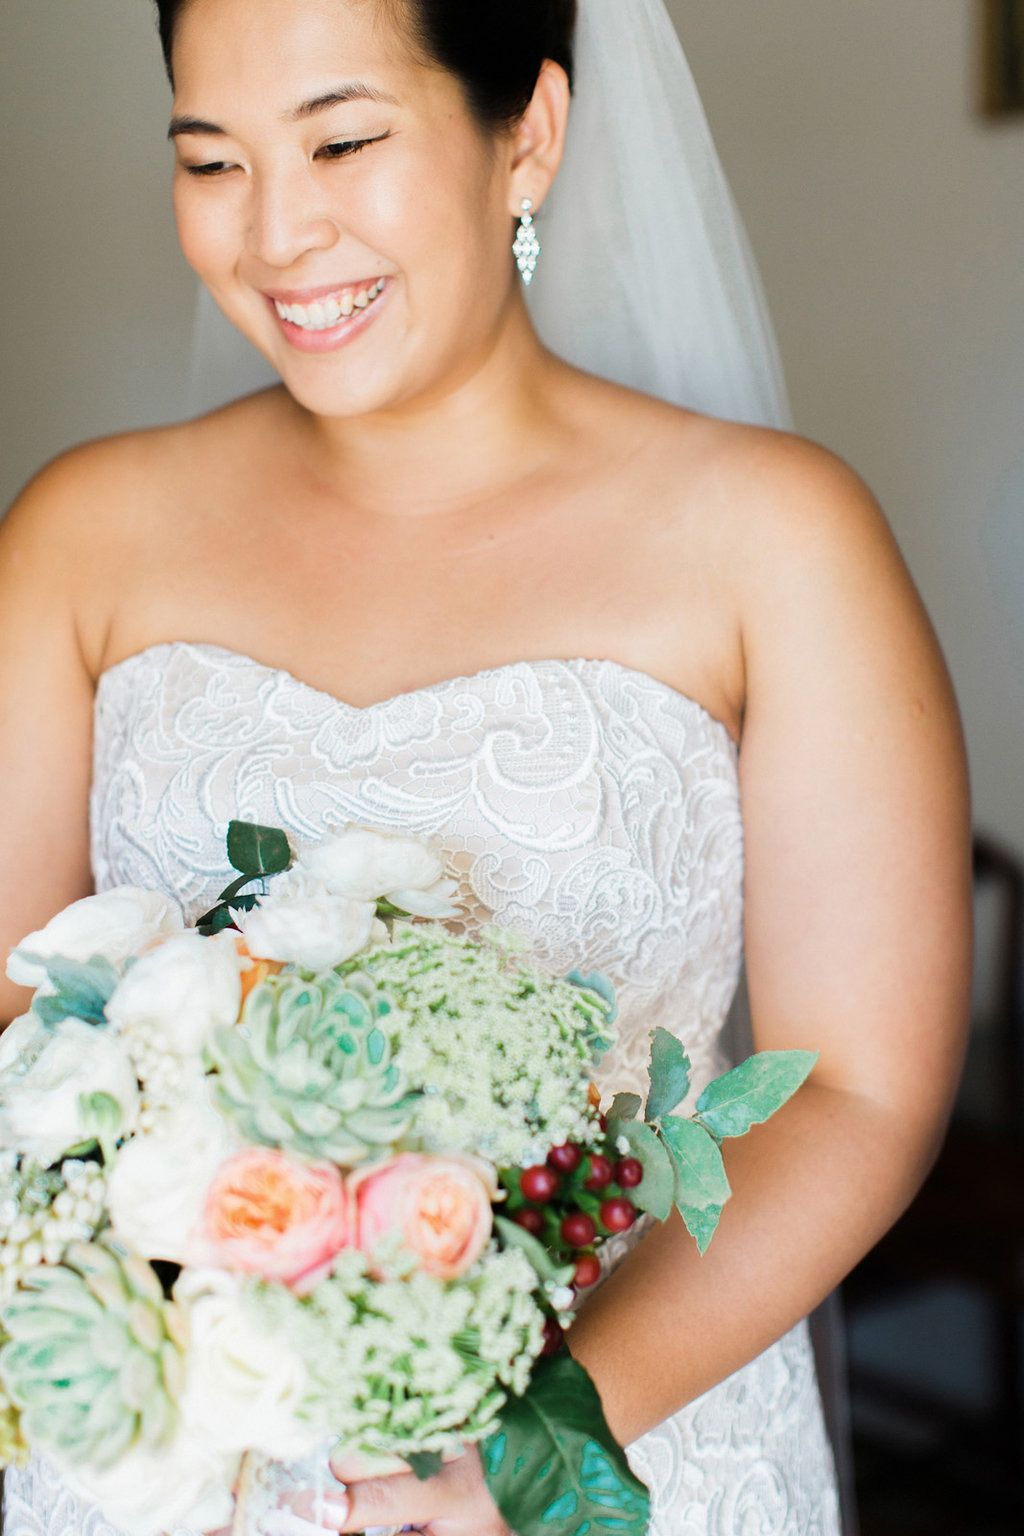 Beautiful bride | Photography: Teneil Kable - www.teneilkable.com/ Read More: http://www.stylemepretty.com/australia-weddings/2015/06/11/contemporary-yacht-club-wedding-in-perth/